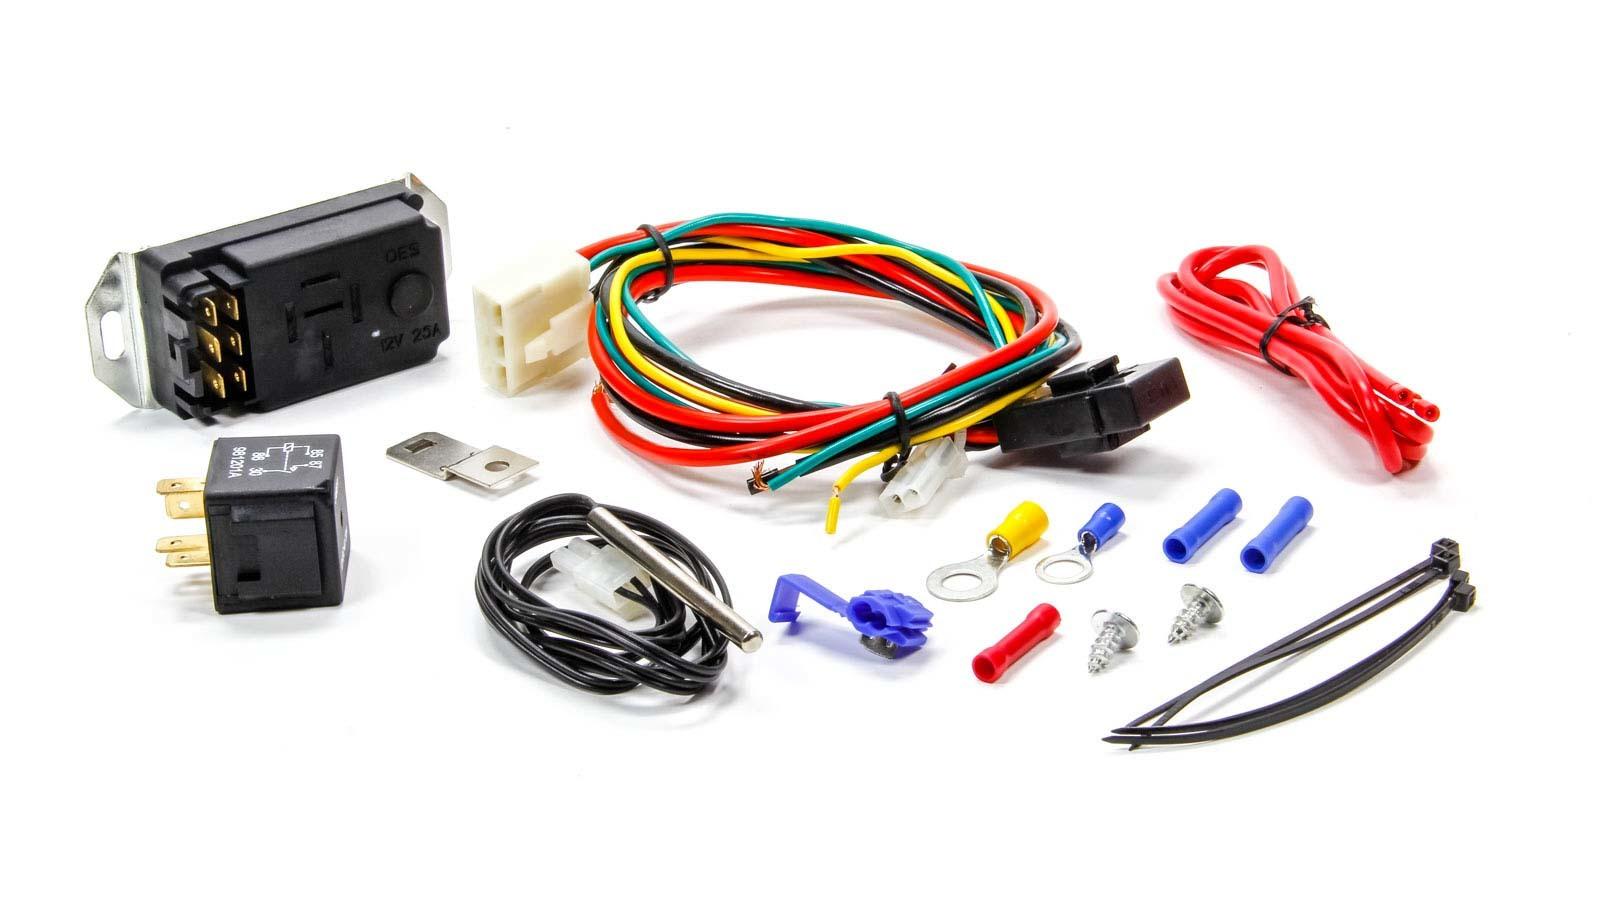 Proform Adjustable Electric Fan Controller Push-In Probe